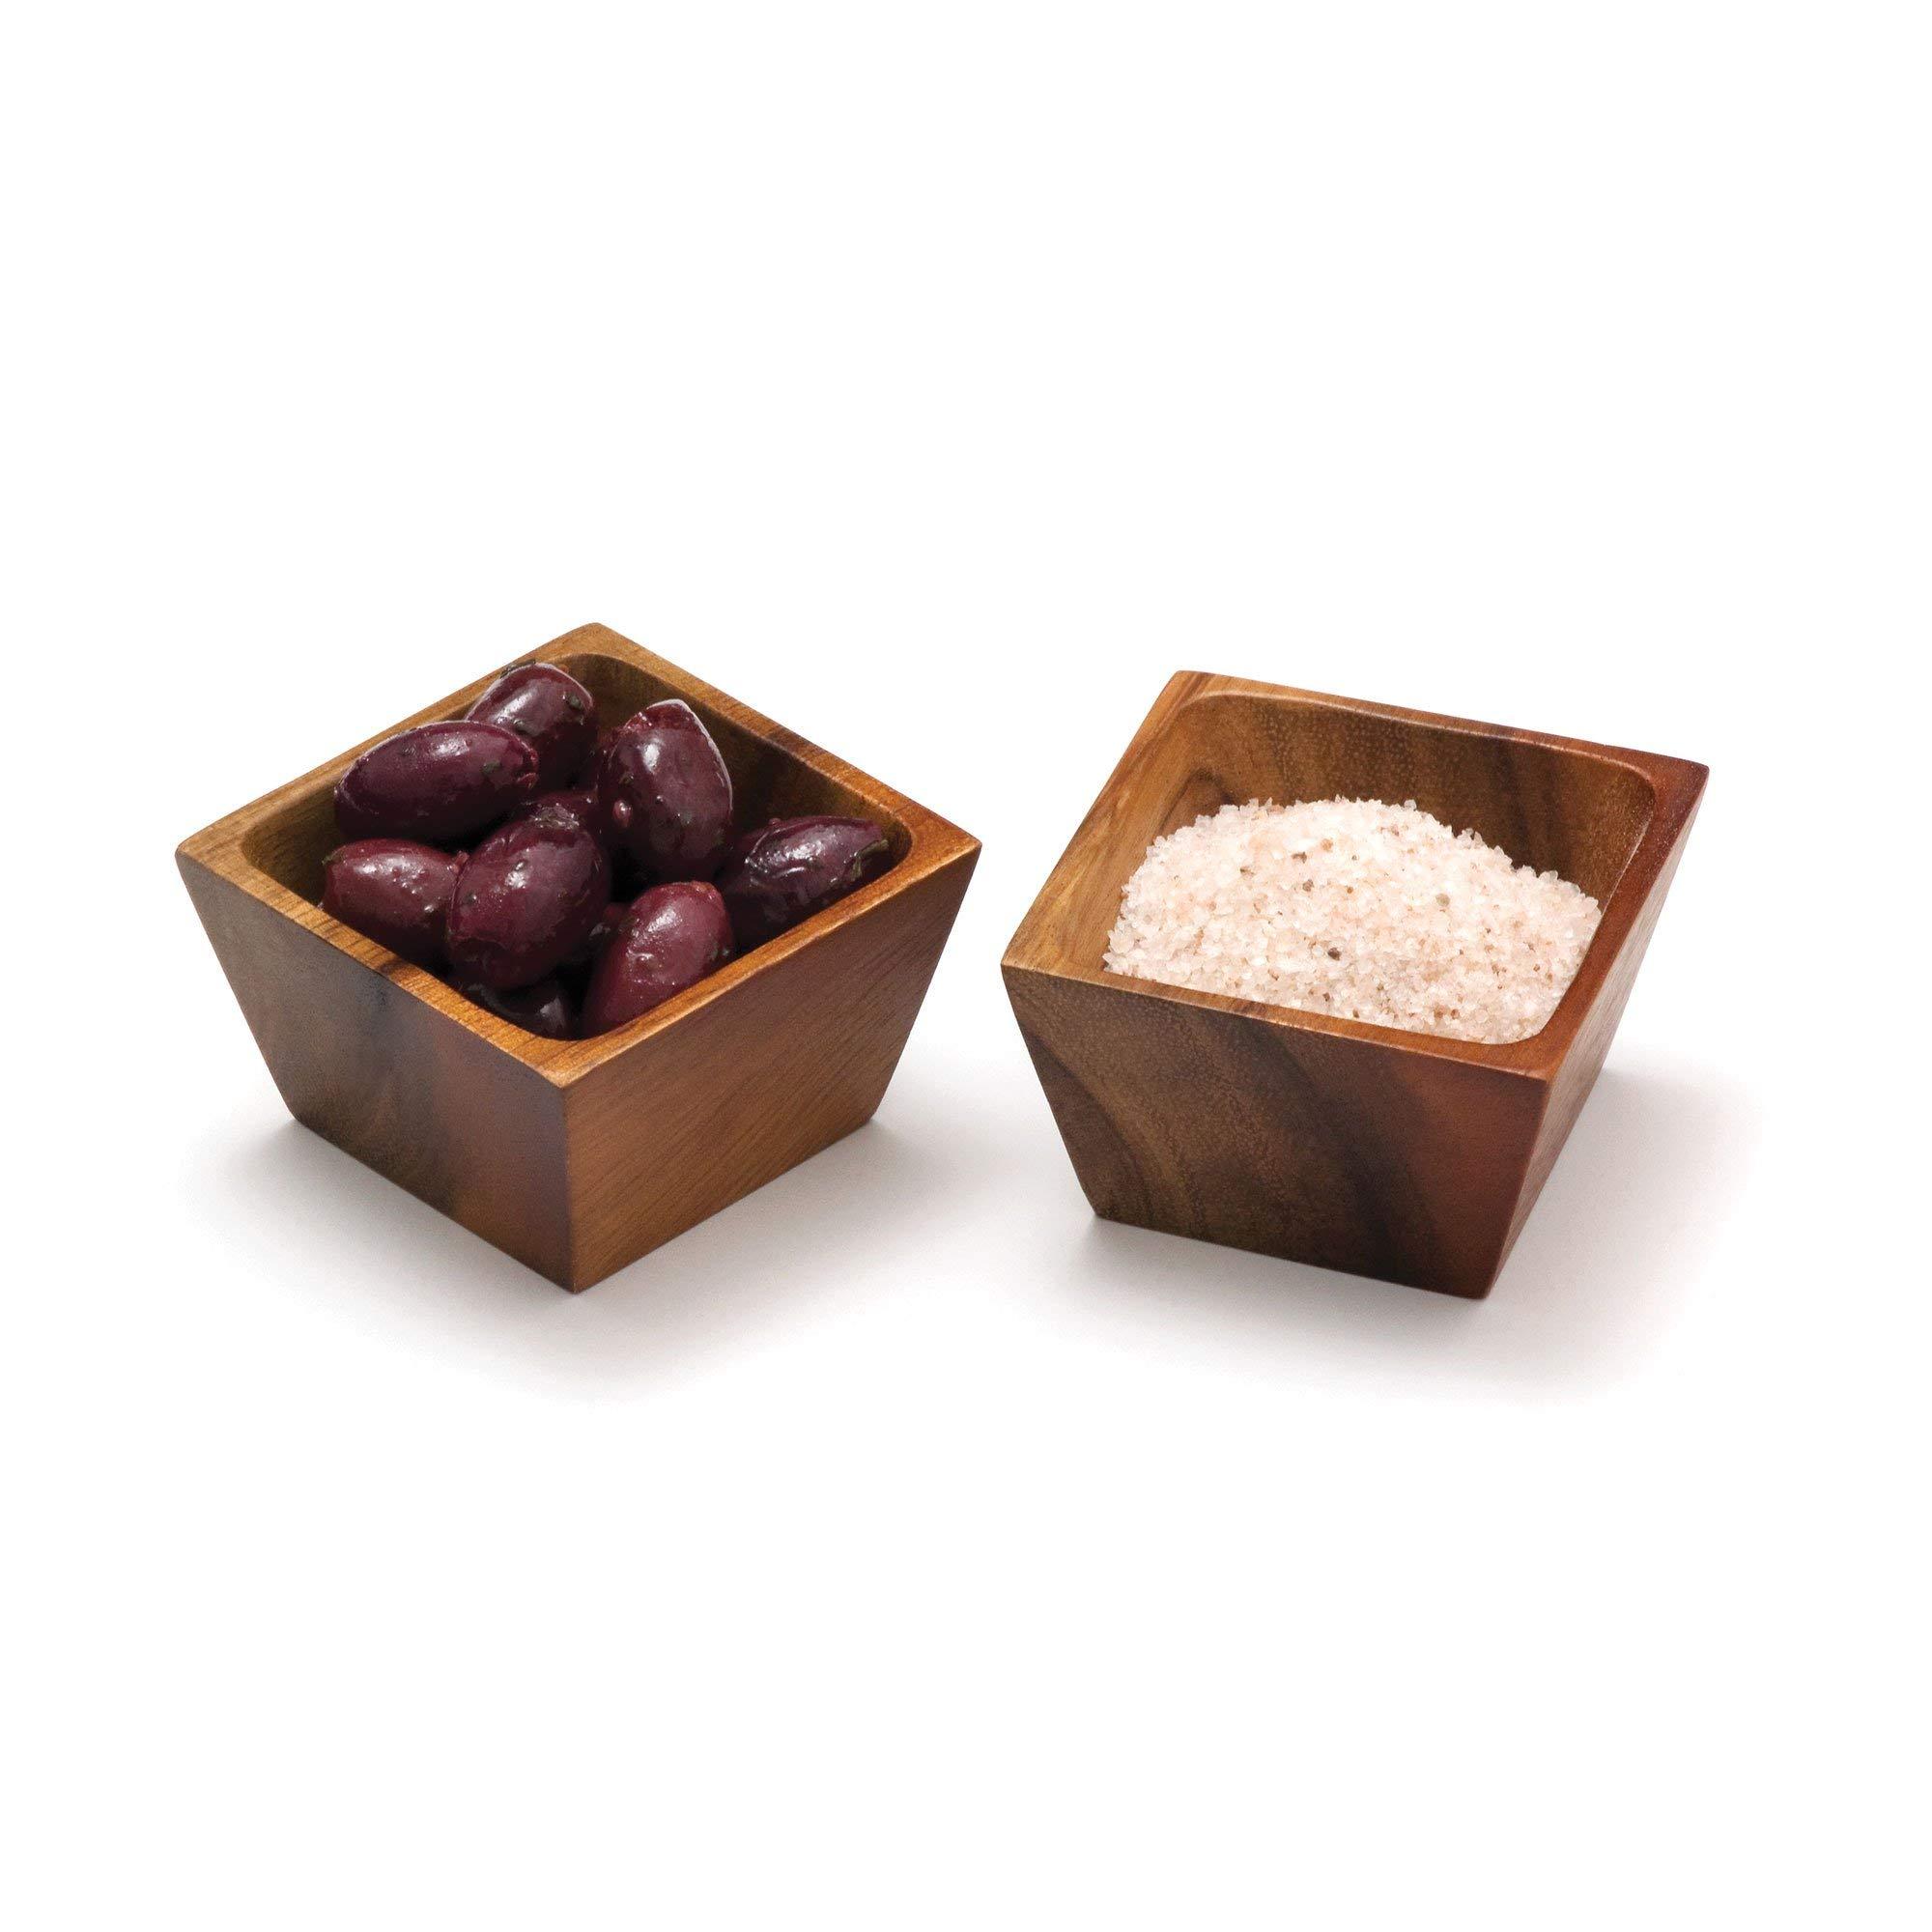 Lipper International 1100-2 Acacia Wood Square Salt Pinch or Serving Bowls, 3'' x 3'' x 2-1/2'', Set of 2 by Lipper International (Image #4)